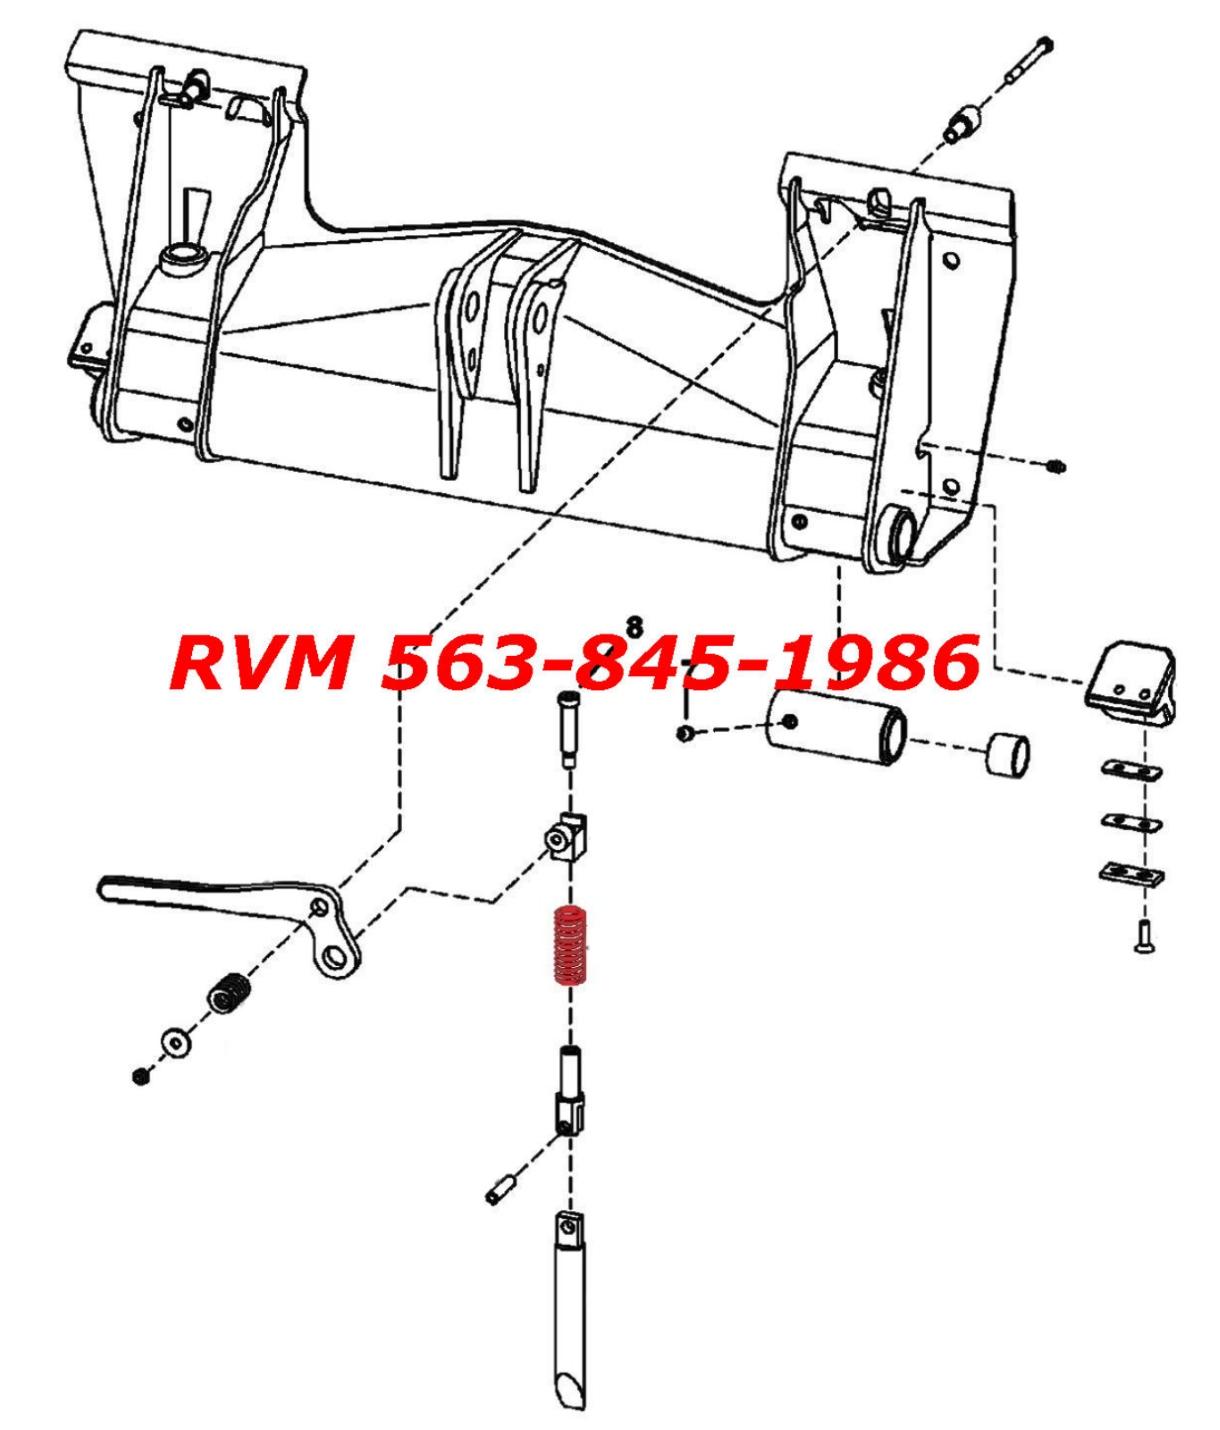 Bobcat Bobtach Wedge Spring S630 S650 S70 S740 S750 S770 S850 Skid Steer